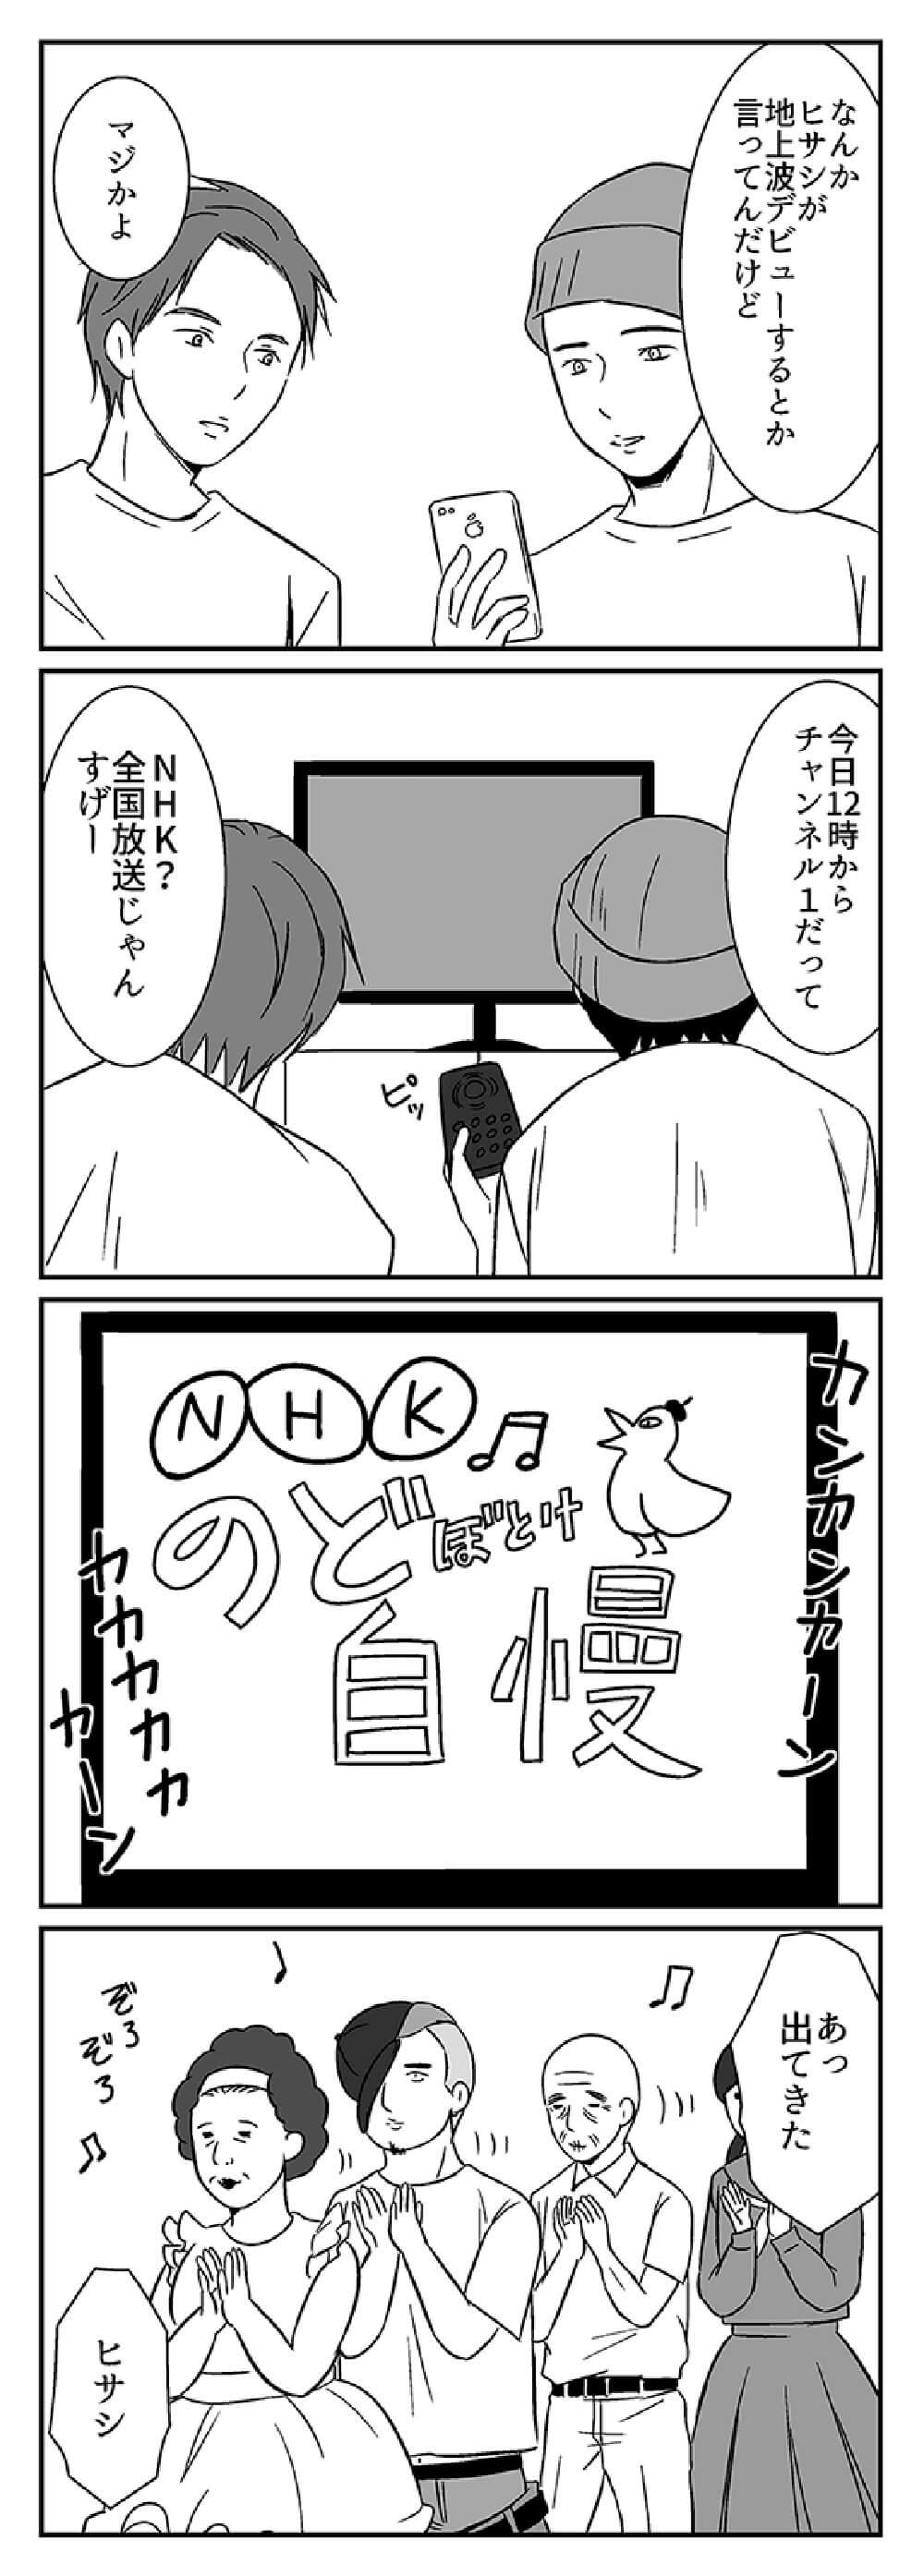 hisashi1_width1000